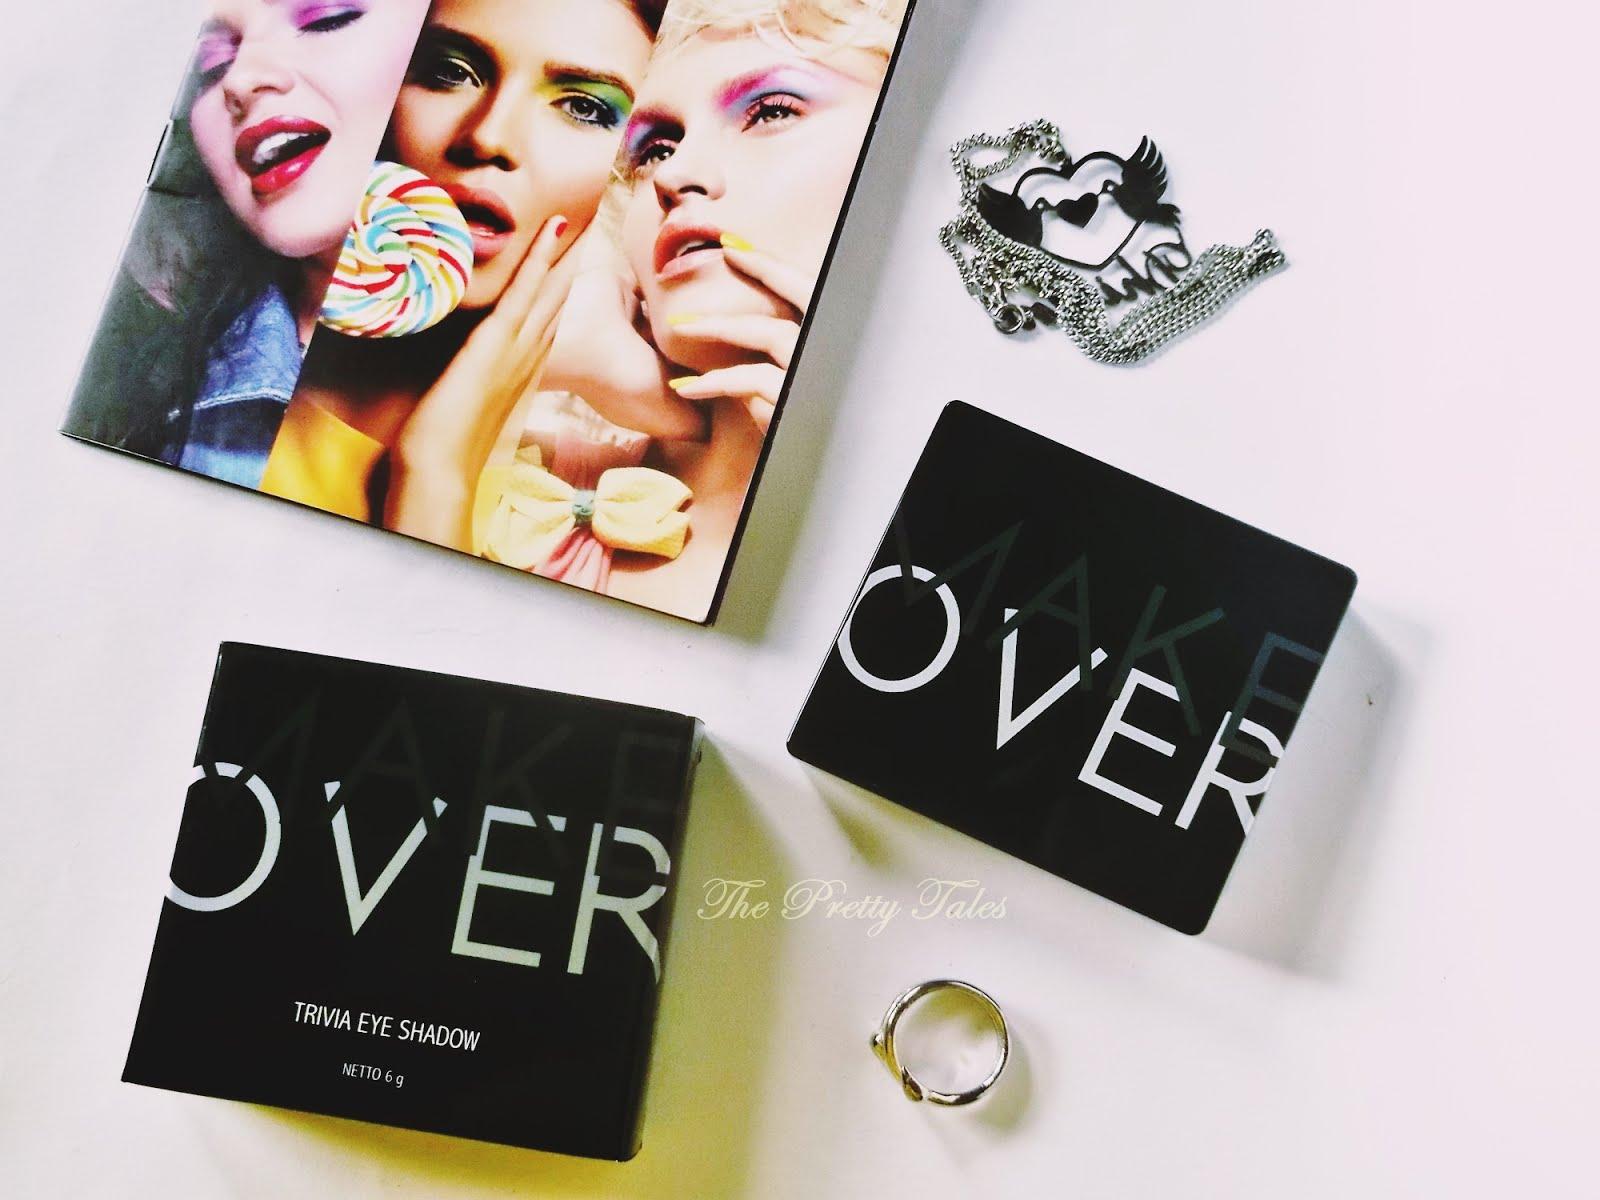 Harga Dan Spesifikasi Make Over Trivia Eye Shadow Termurah 2018 Baju Pria Minion Stuart Koboi Eyeshadow Echanting Nude Spell Daftar Review